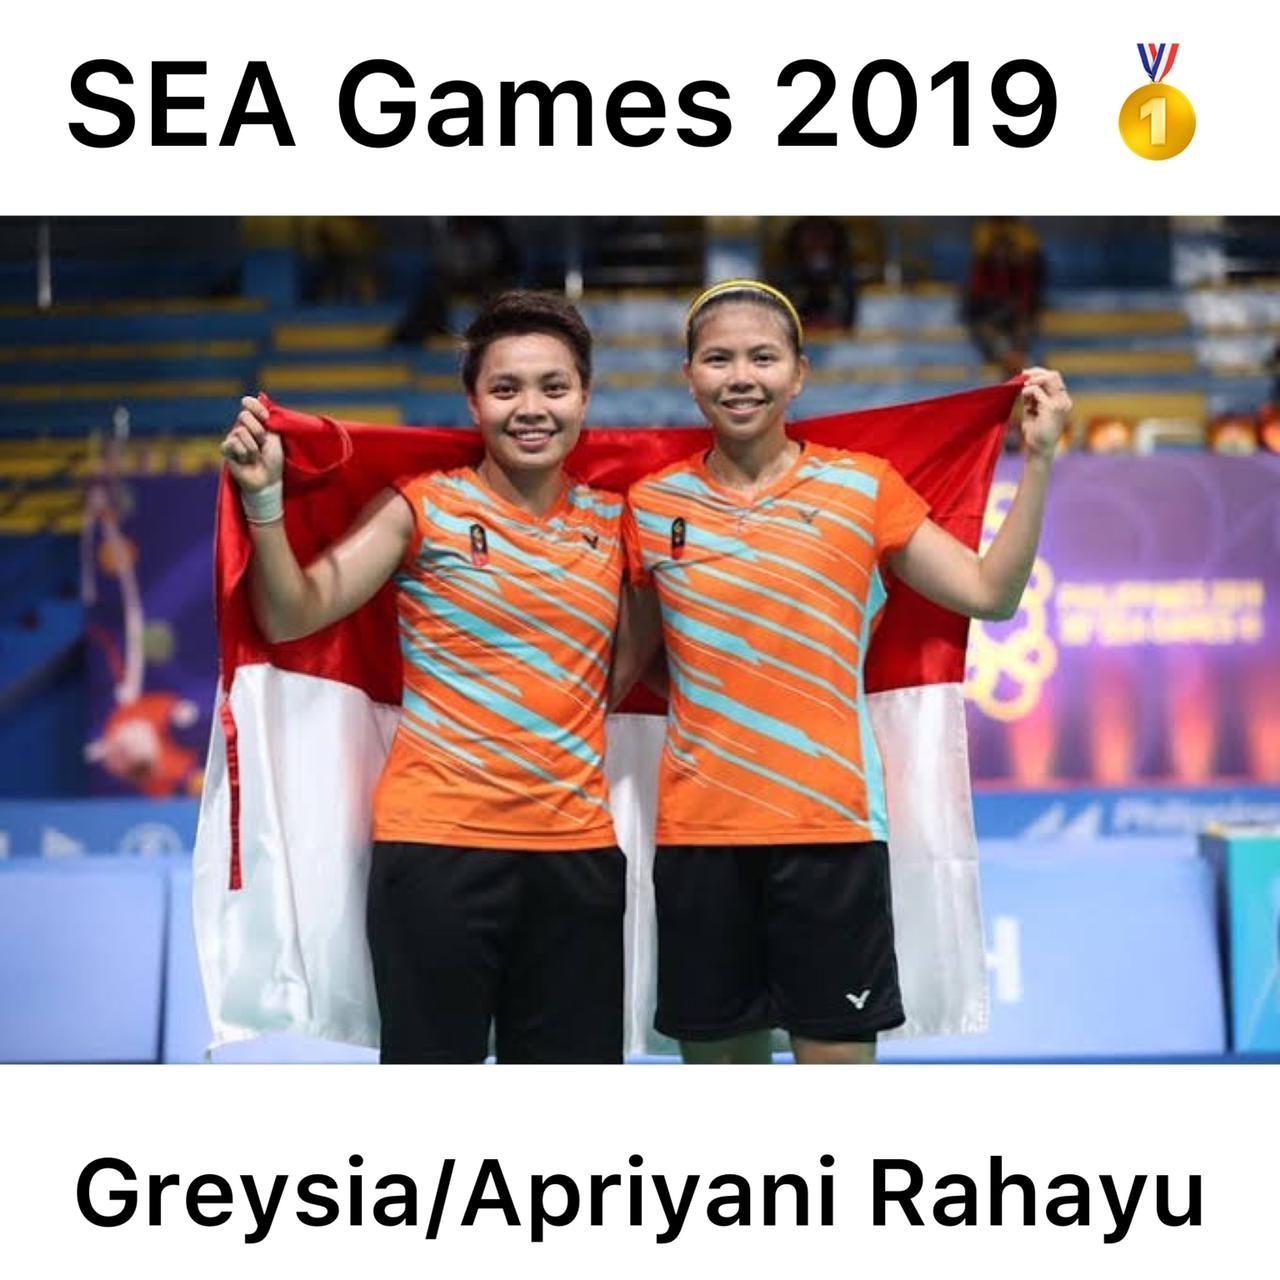 Momen medali emas Greysia Polii/Apriyani Rahayu di SEA Games 2019.